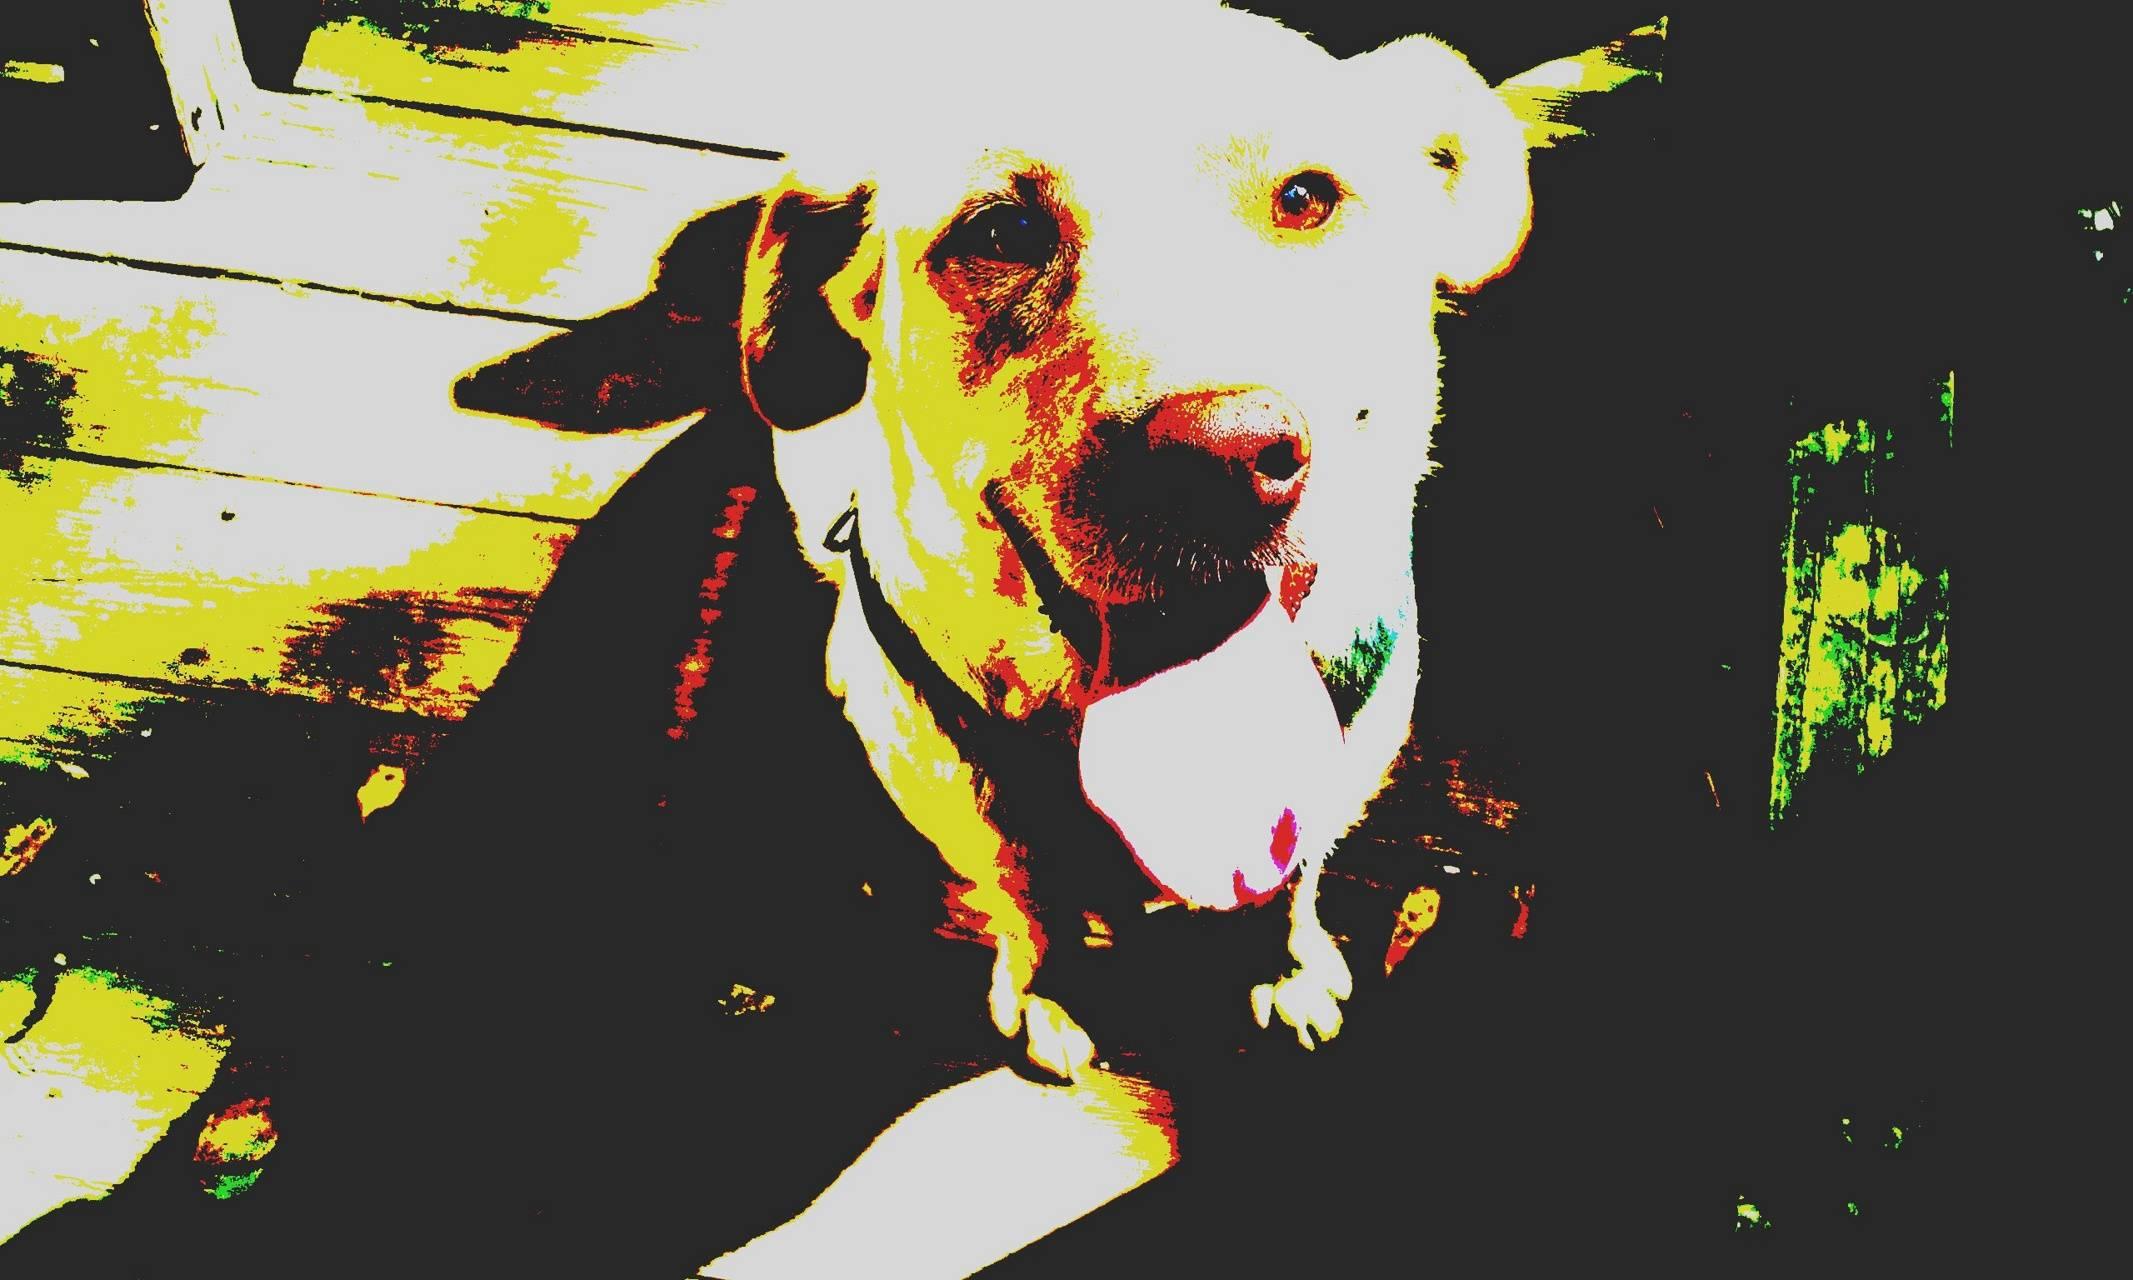 My lab pup